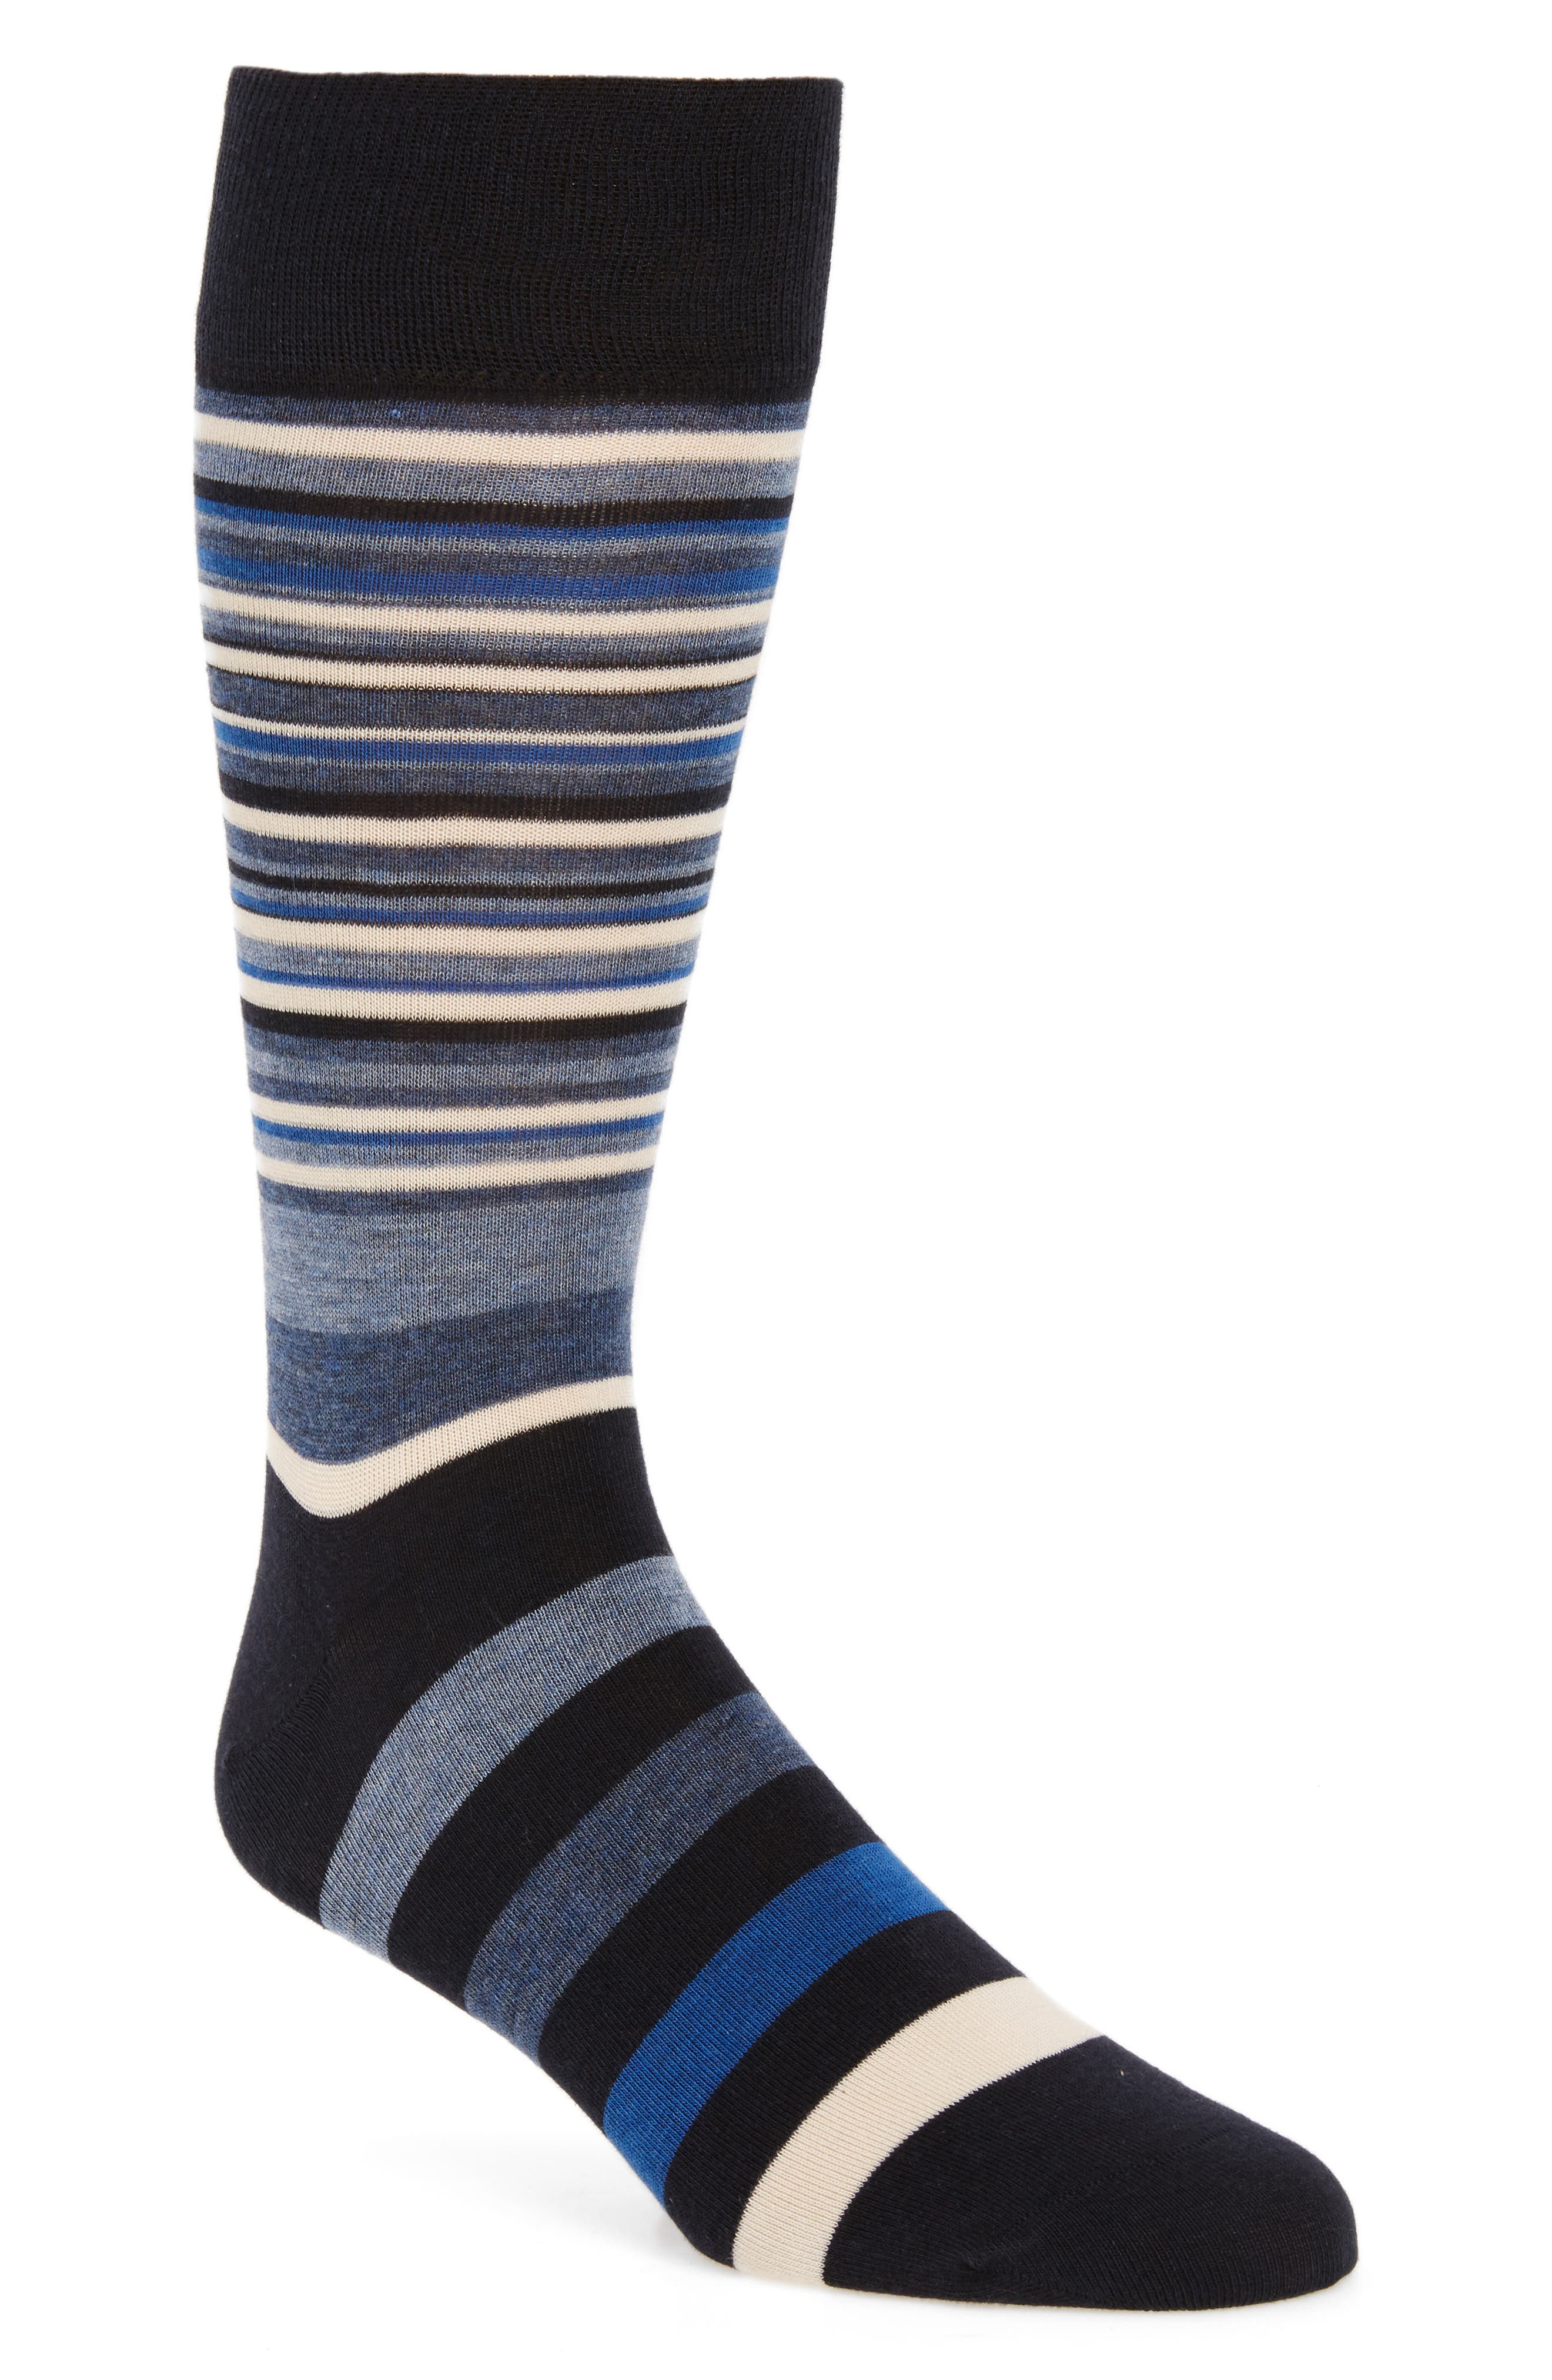 Town Stripe Crew Socks,                             Main thumbnail 1, color,                             Navy/ Astor Blue Stripe